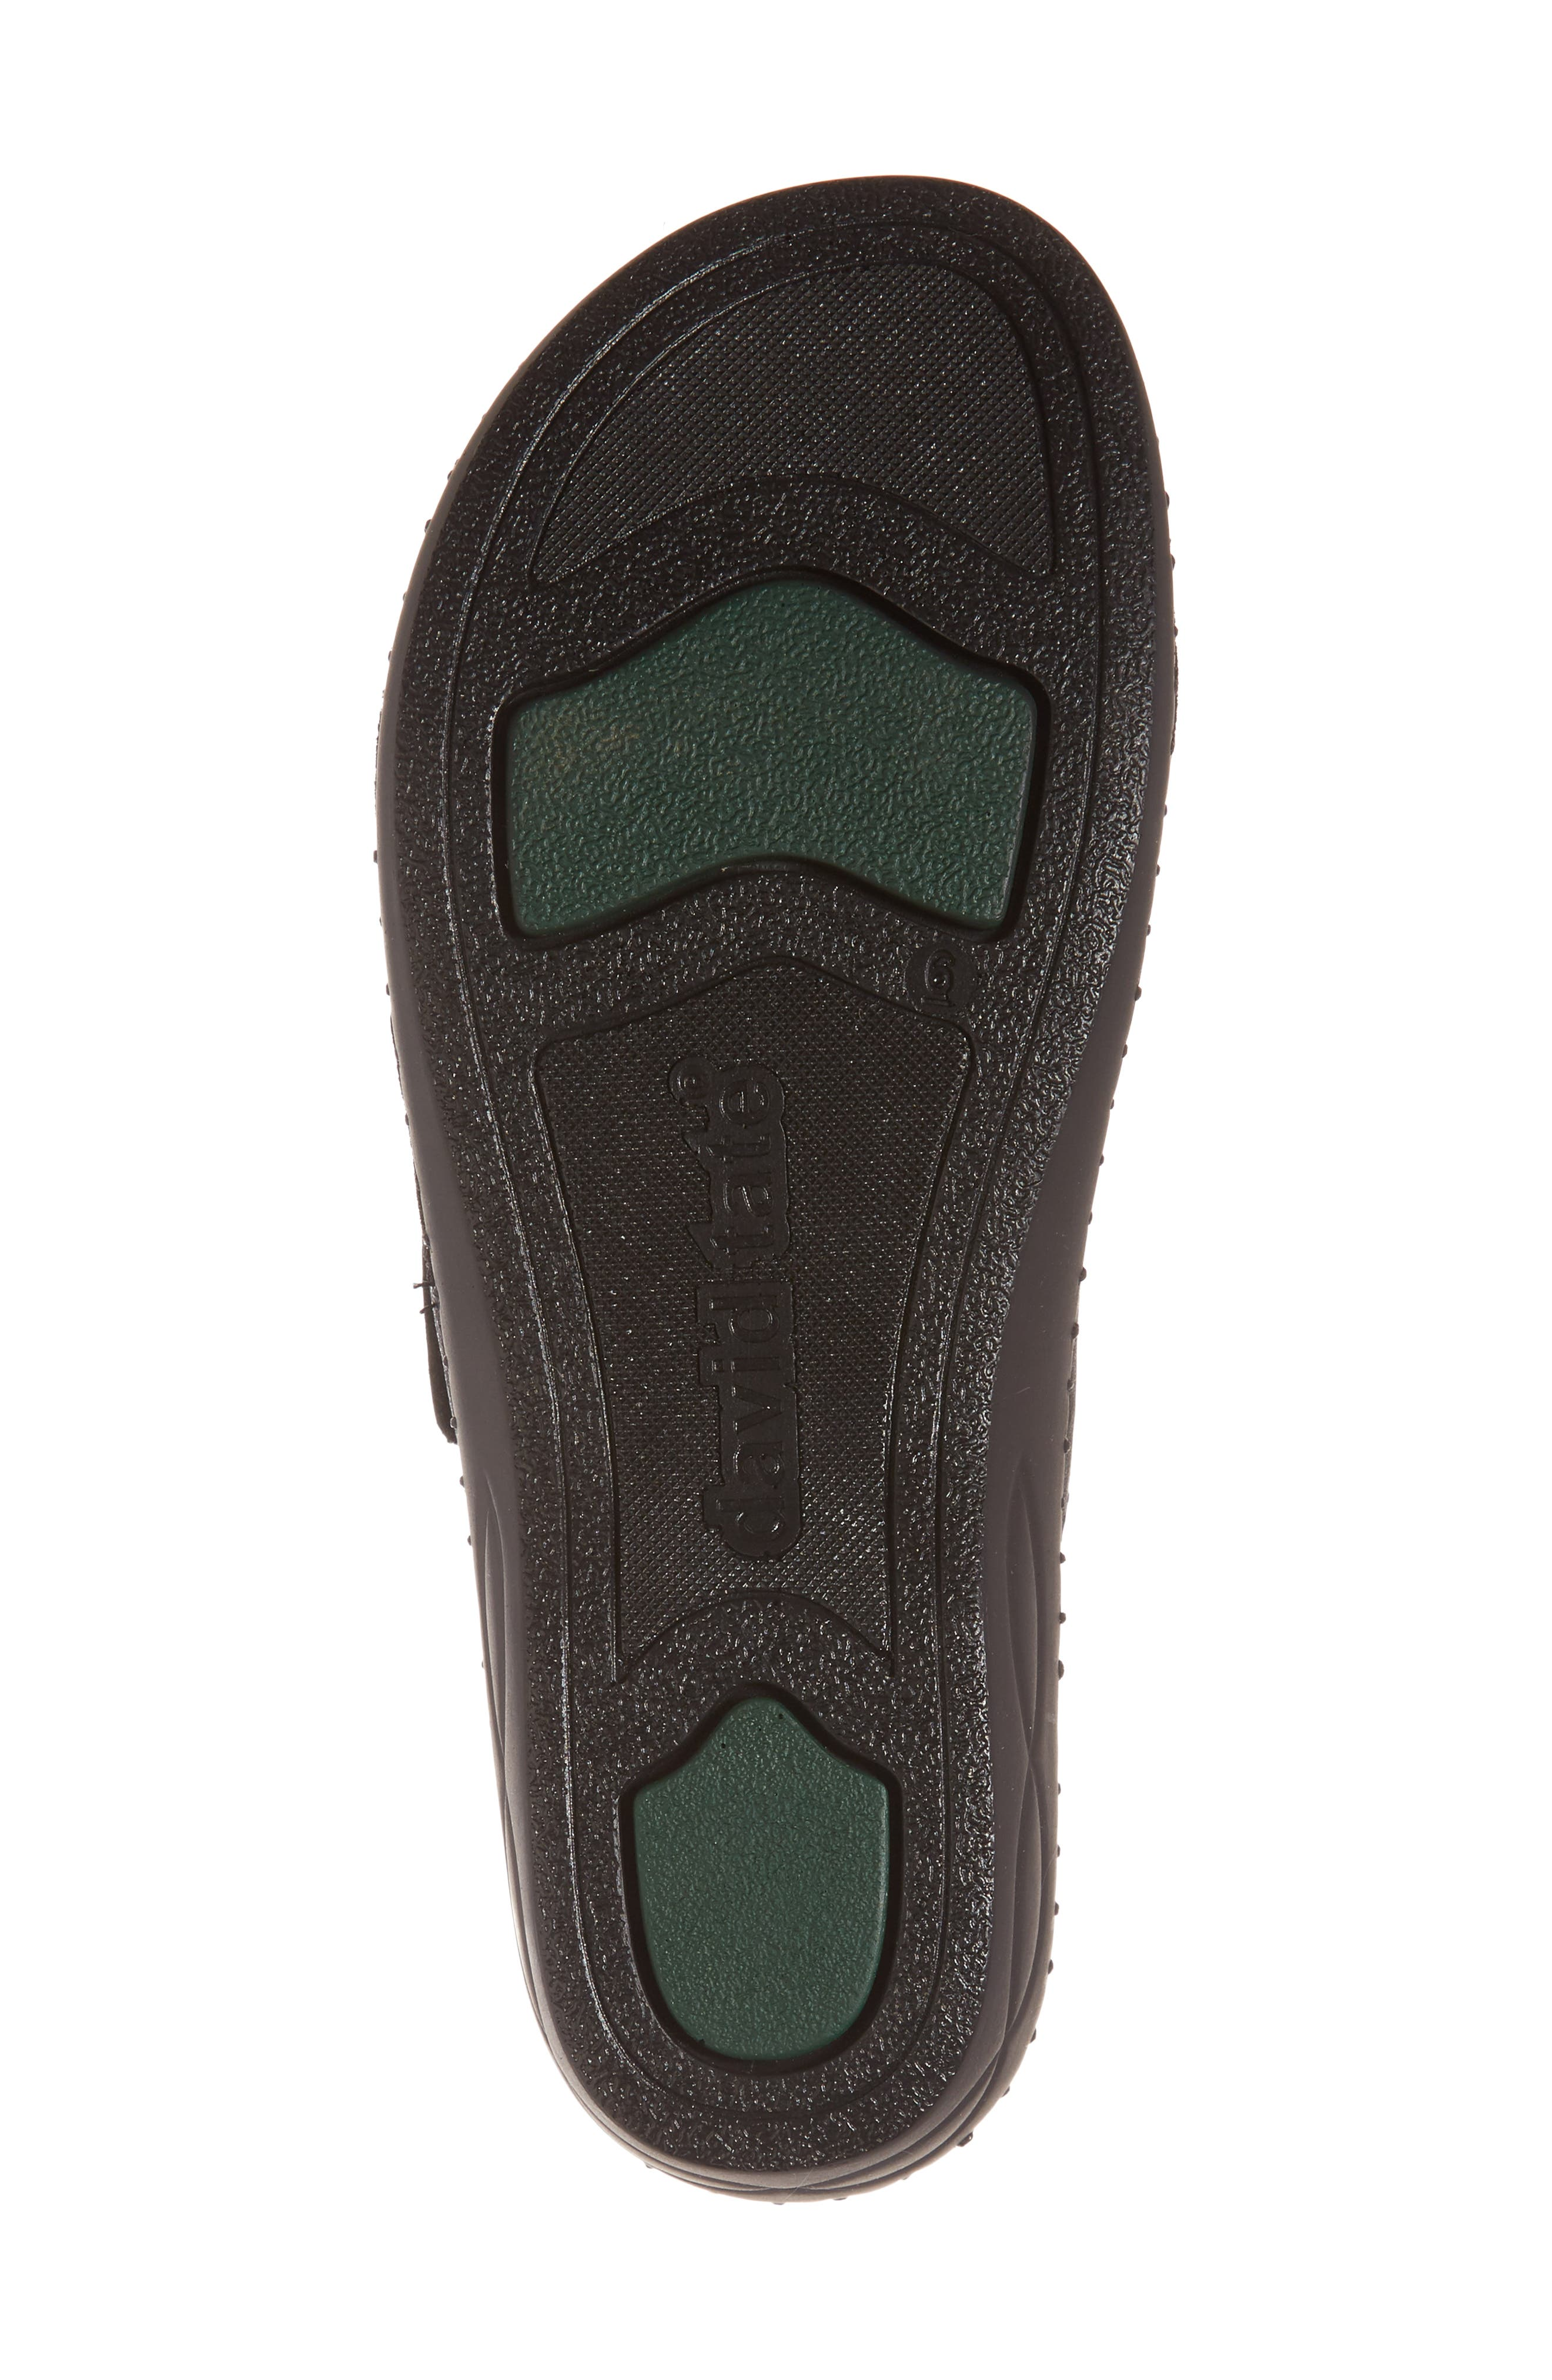 Flex Slide Sandal,                             Alternate thumbnail 6, color,                             BLACK LEATHER